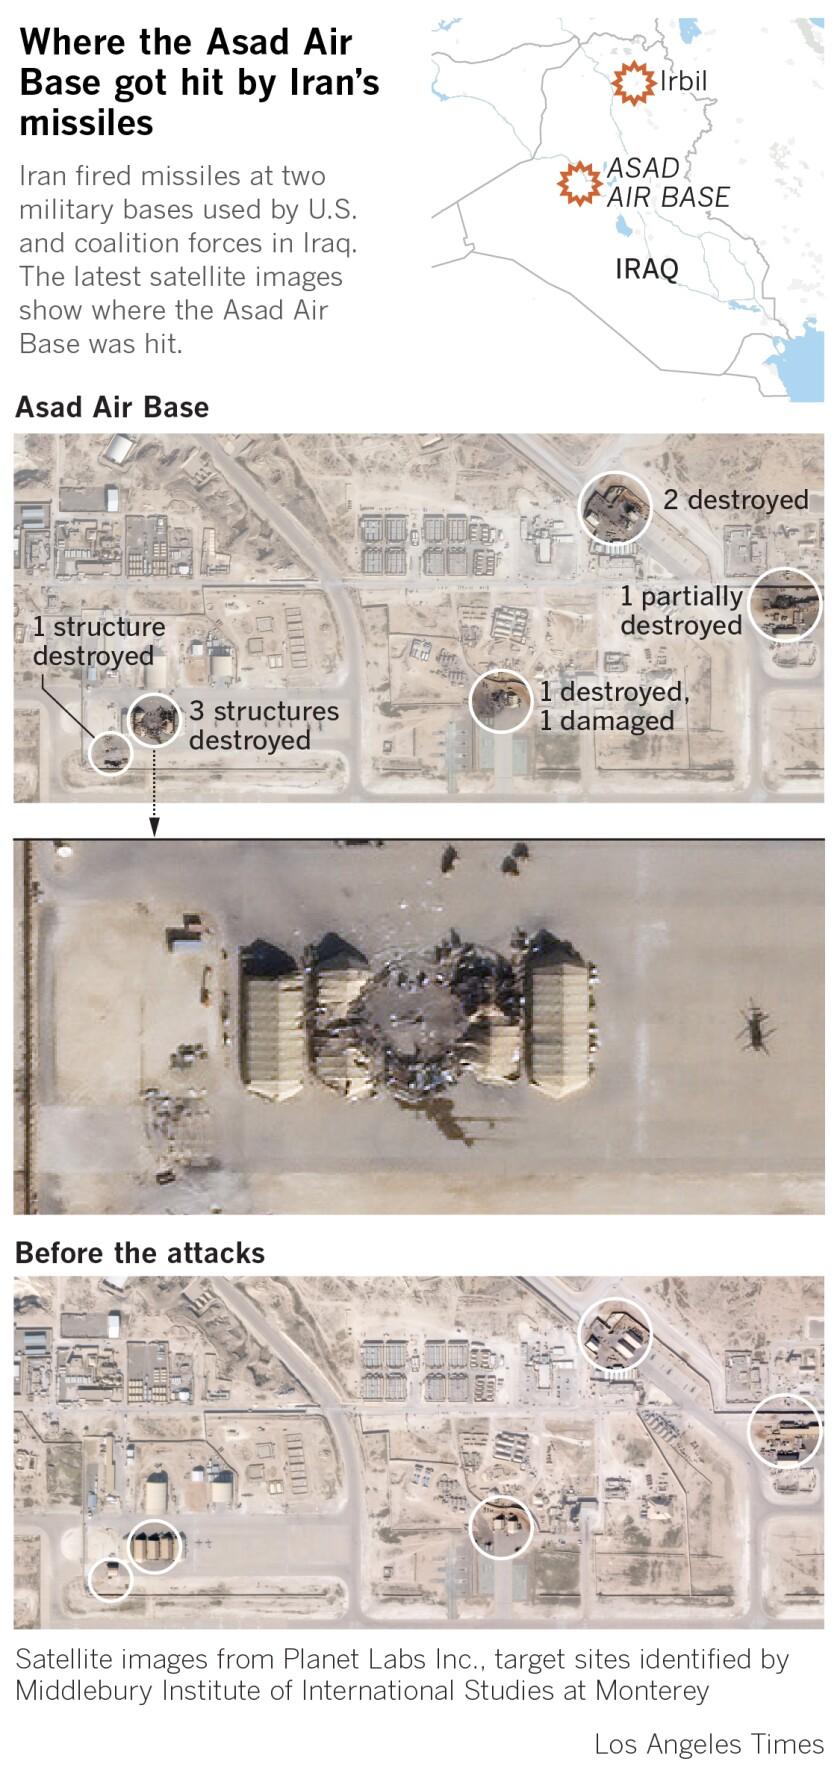 477689-w1-la-na-pol-iran-missile-targeting-20200108.jpg